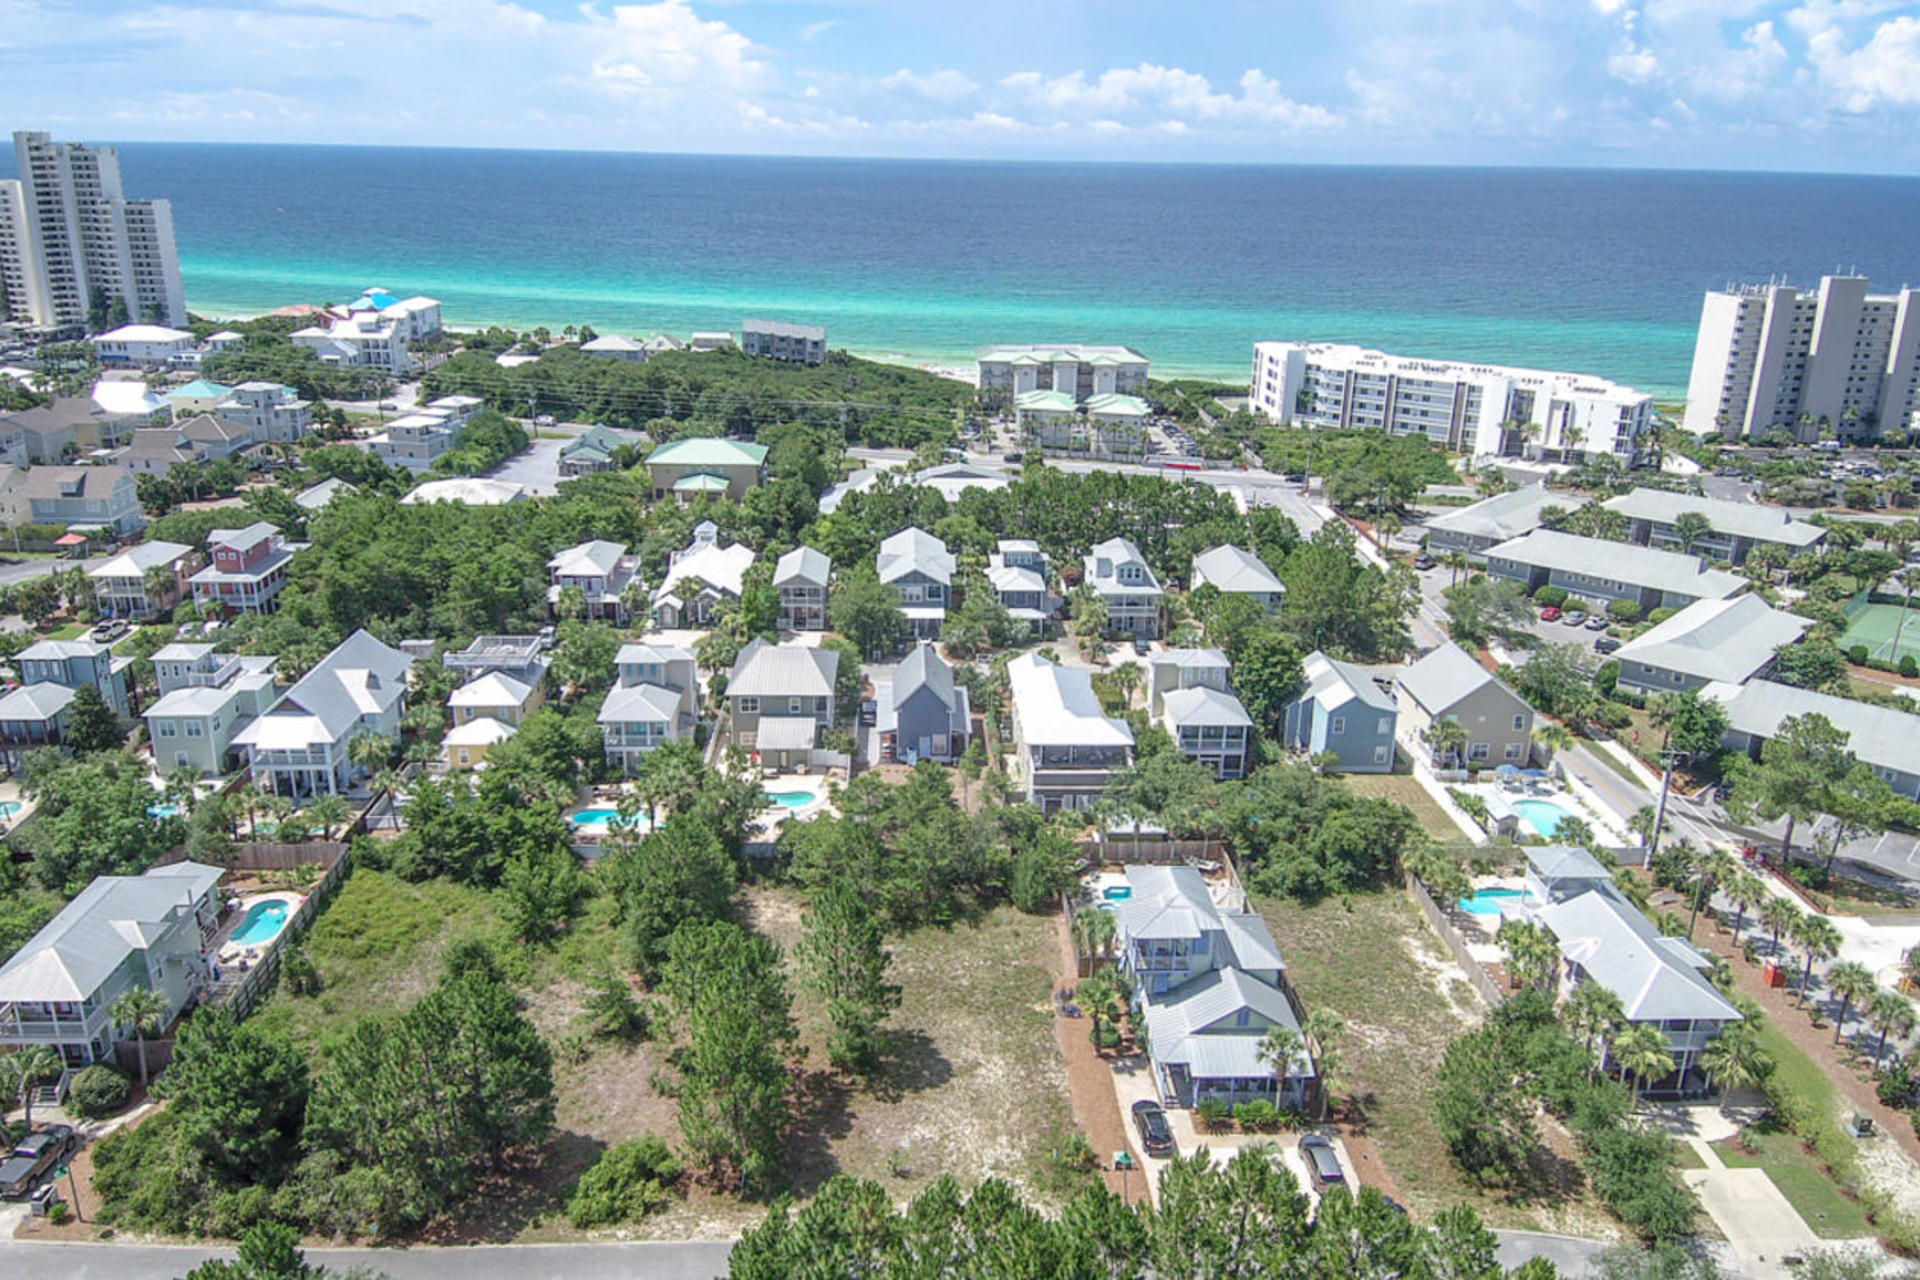 Photo of home for sale at Lot 4 Sand Dollar, Santa Rosa Beach FL